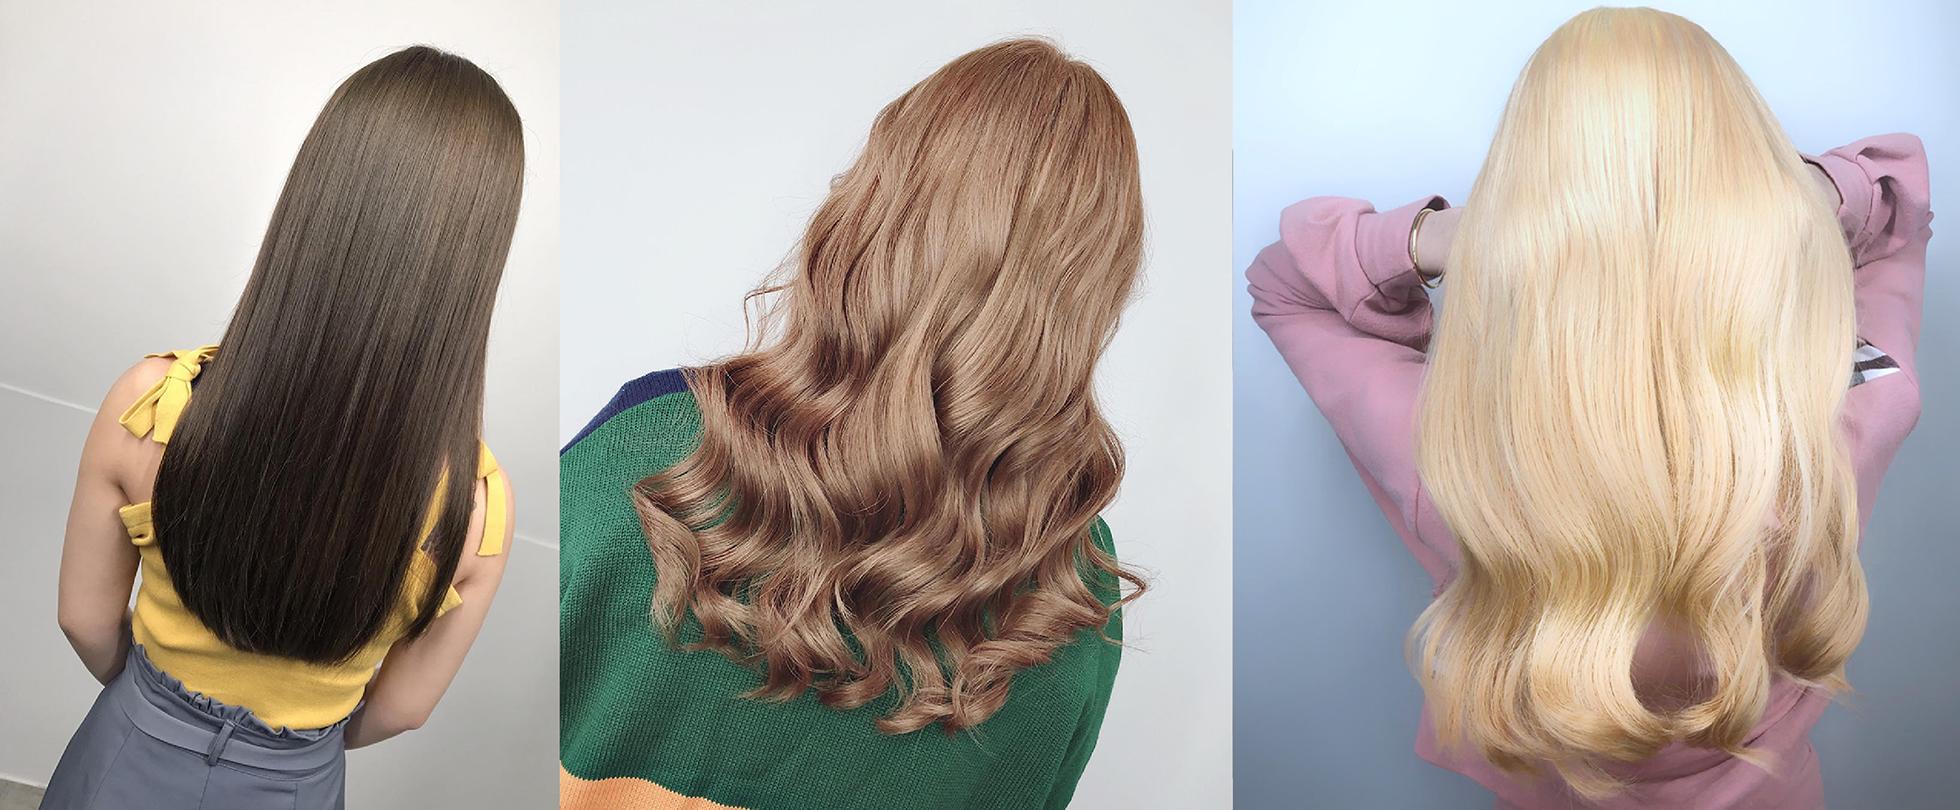 Ink Hair髮型作品集三張長髮女孩的背影照片